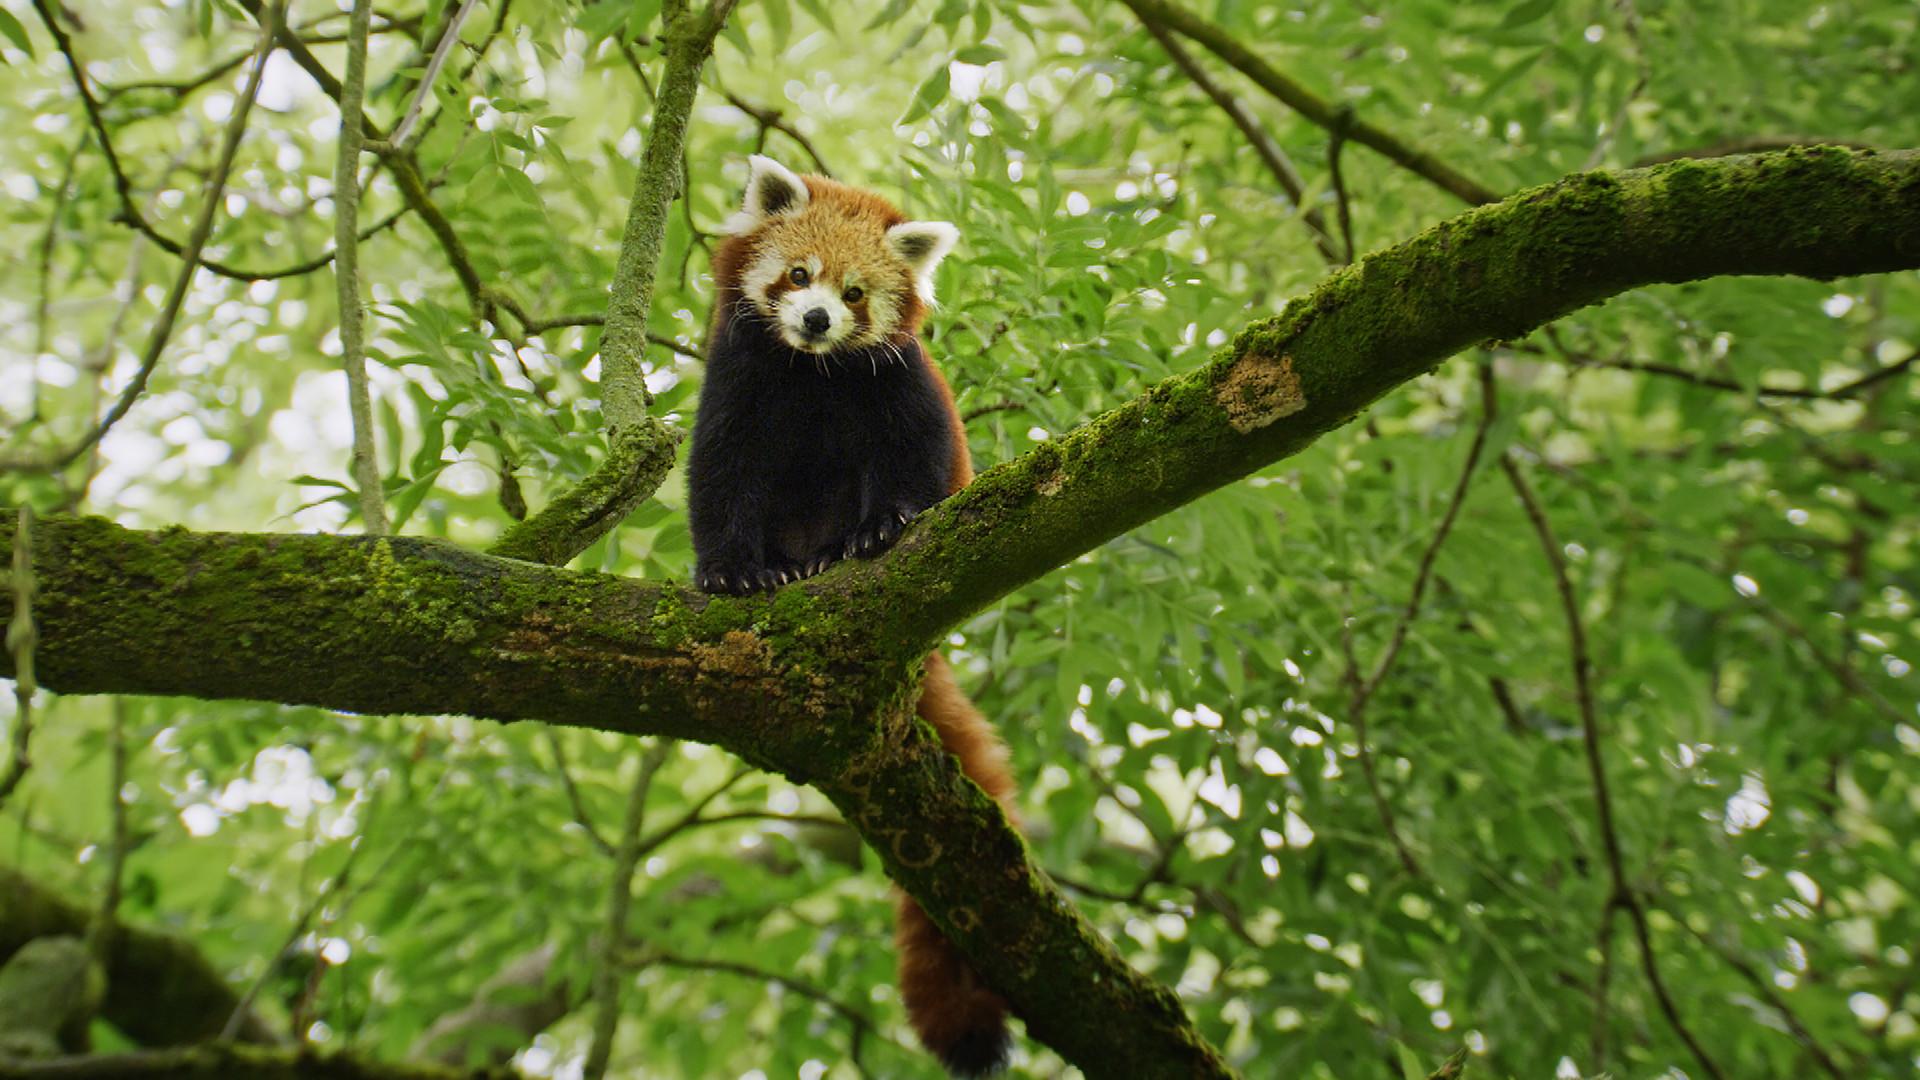 L&S_Pressefotos_ZOO_EP1_100_Panda.jpg